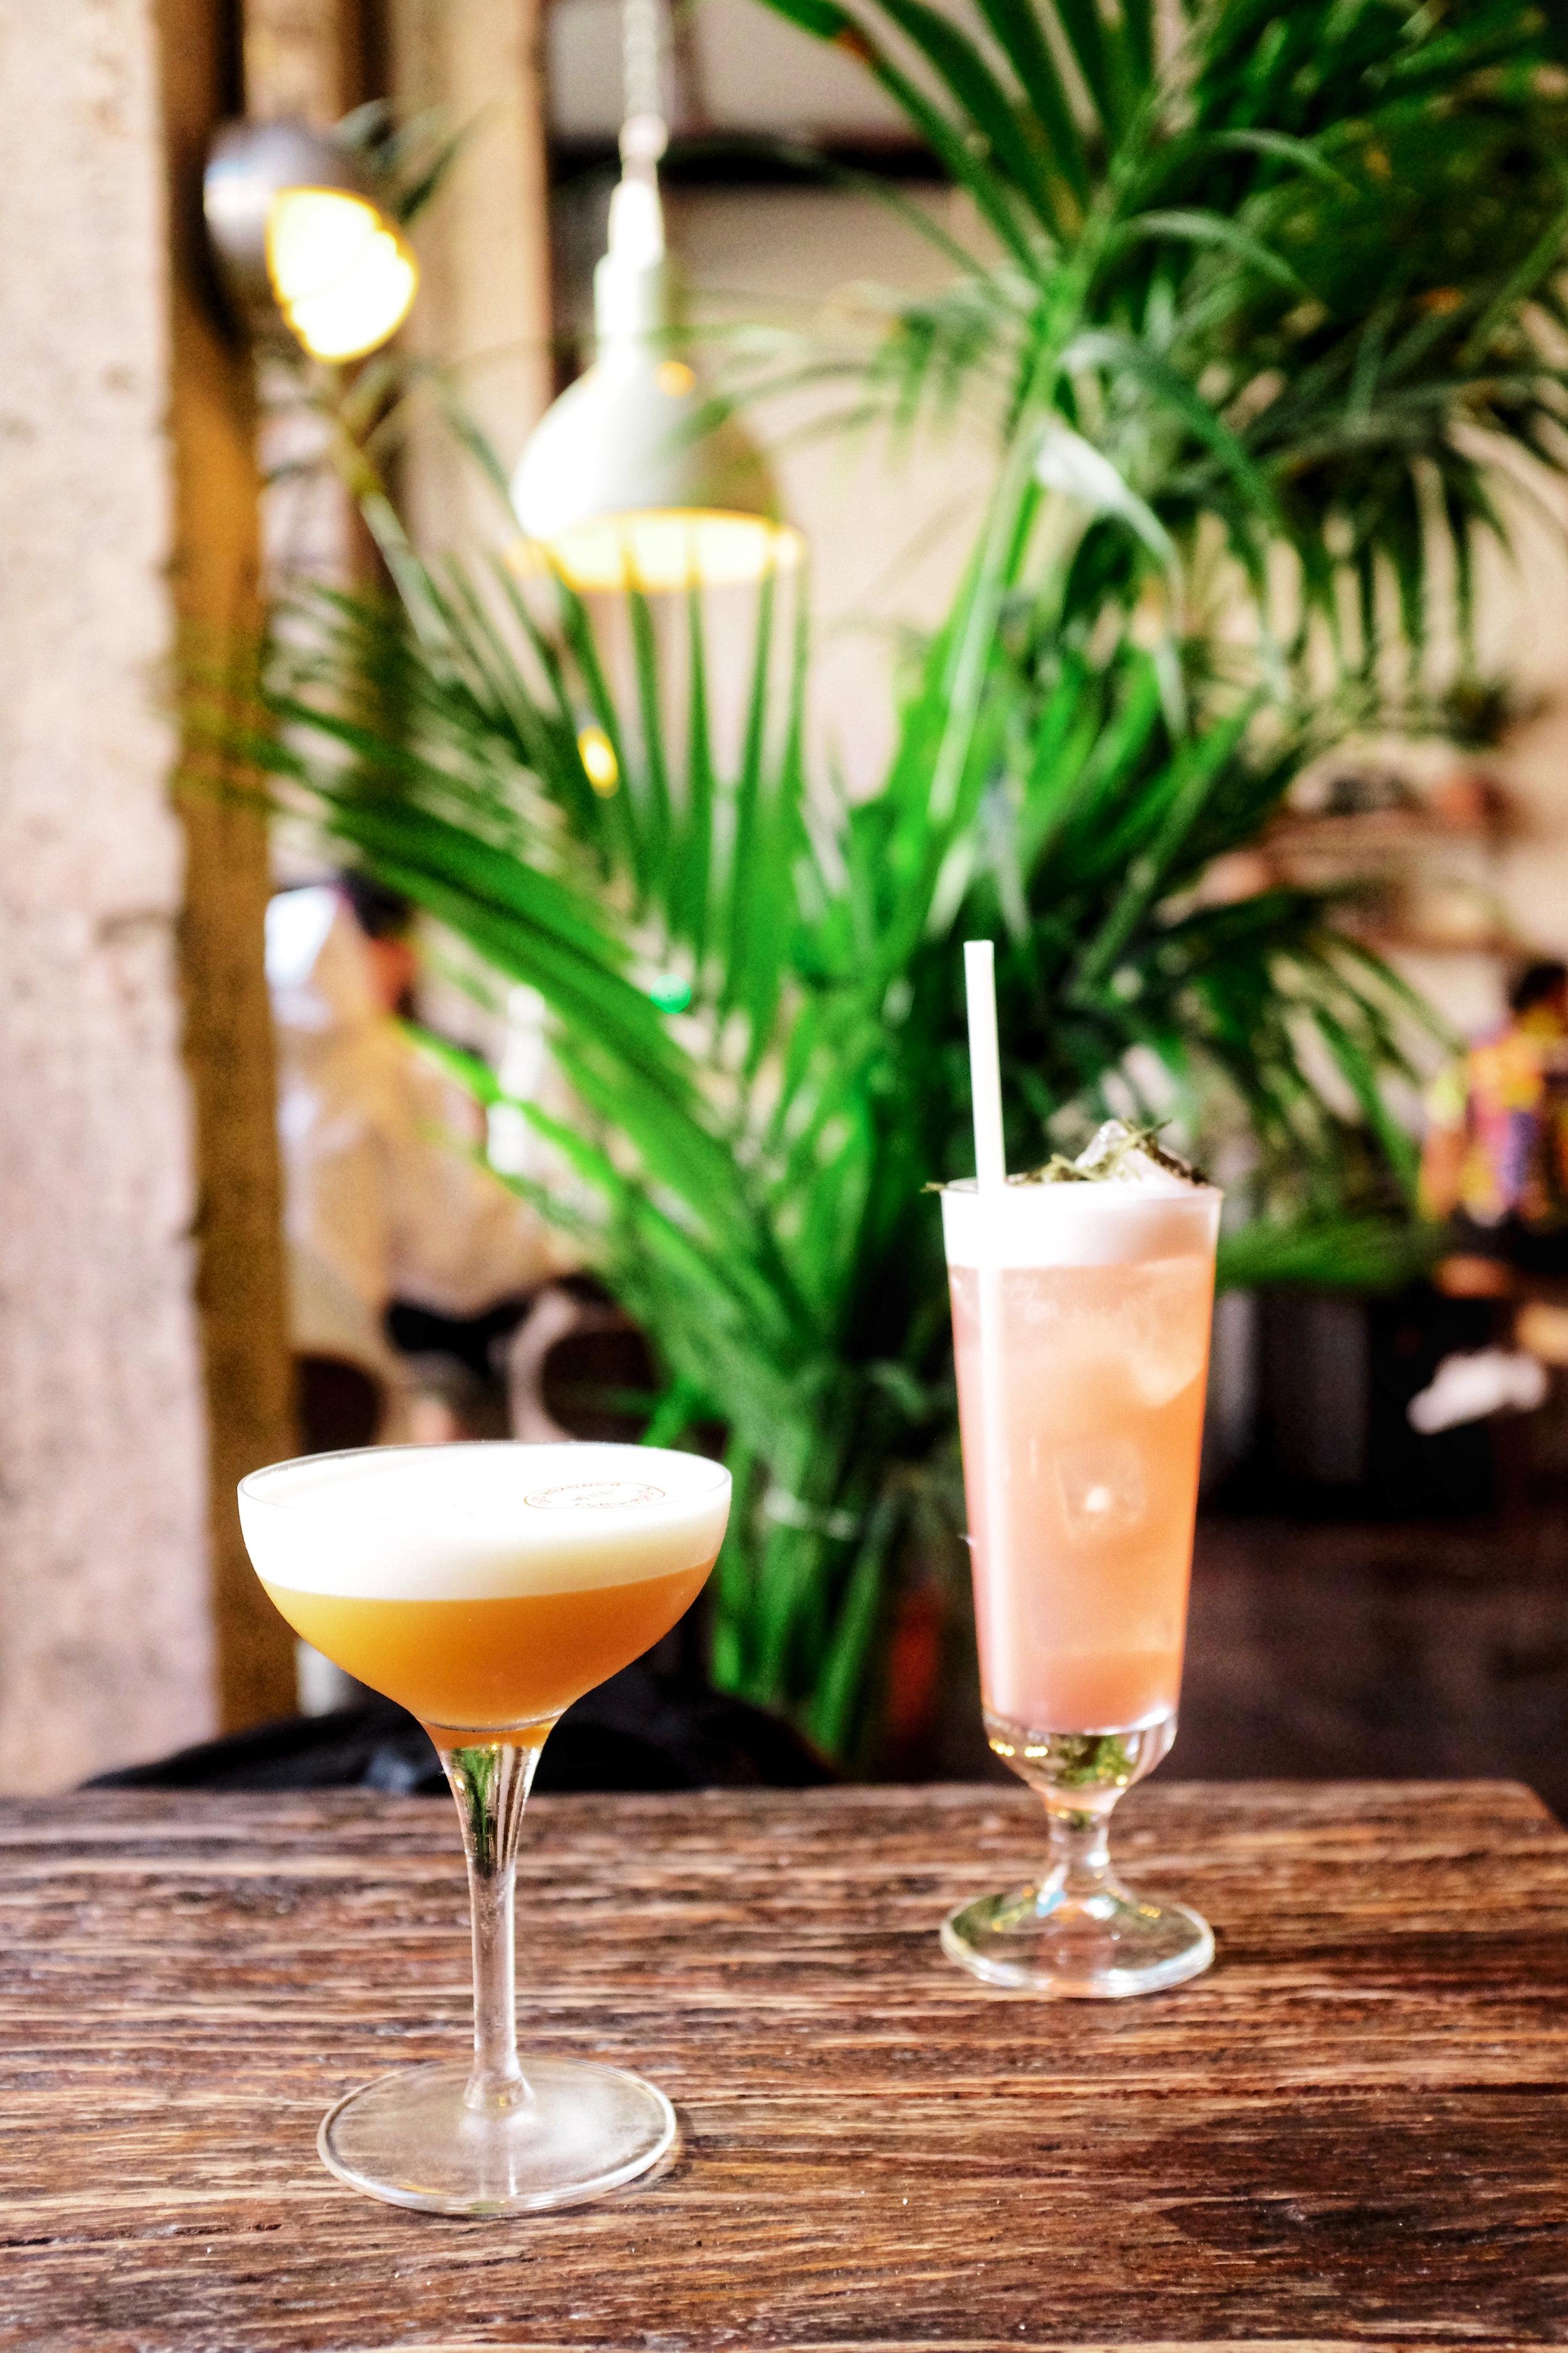 cocktails at som saa east london